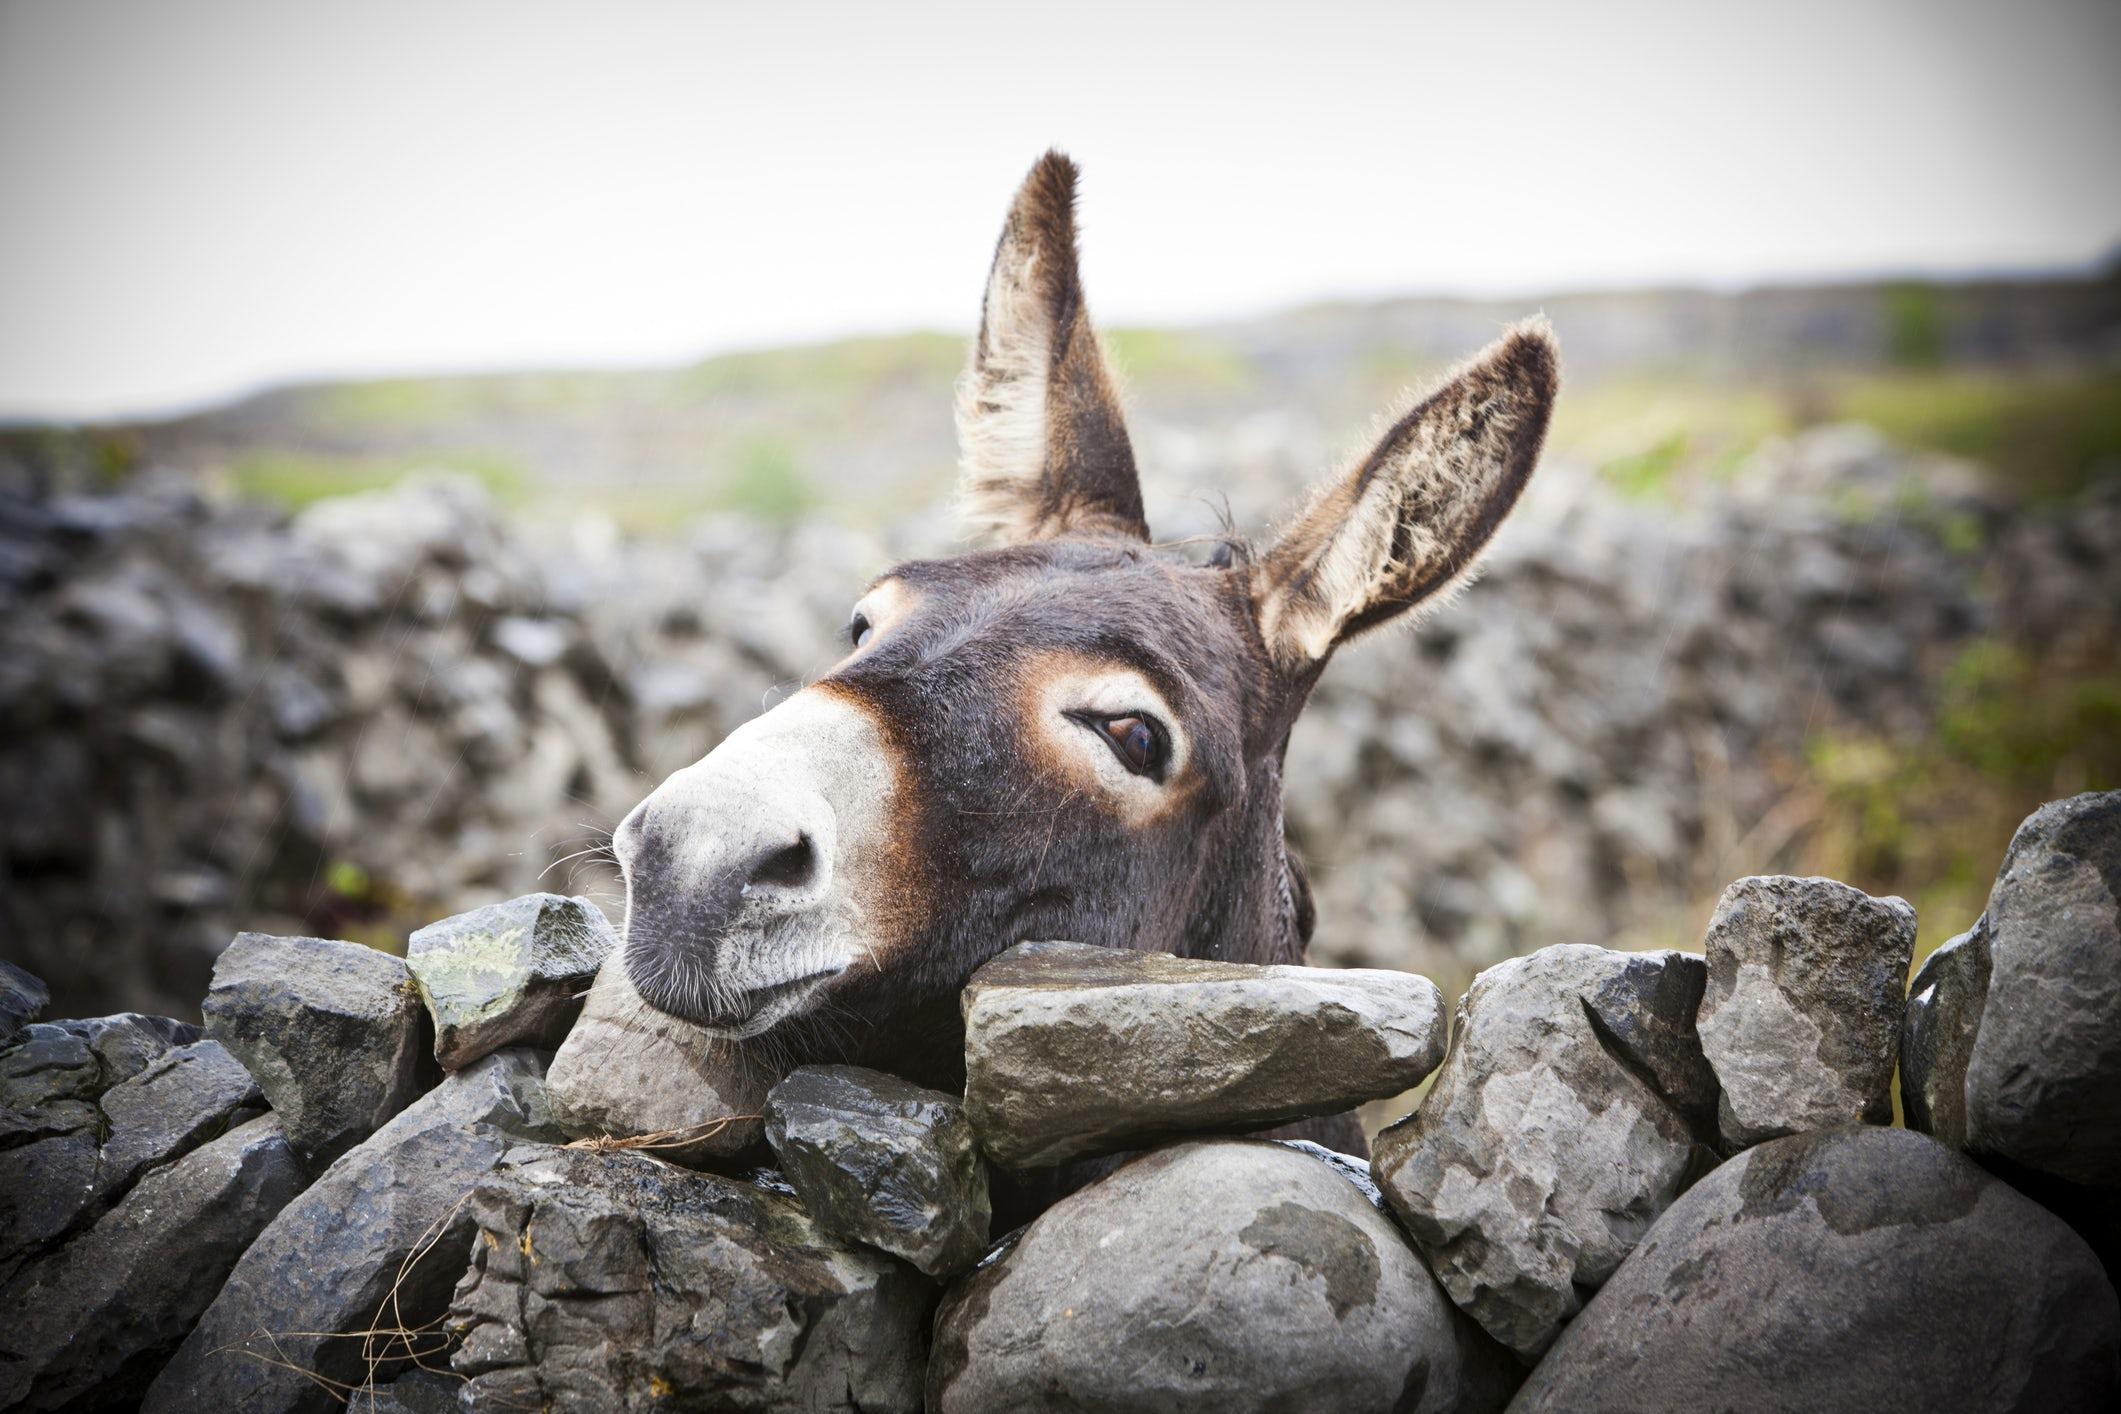 Donkey farm – an unusual attraction near Montenegro's capital